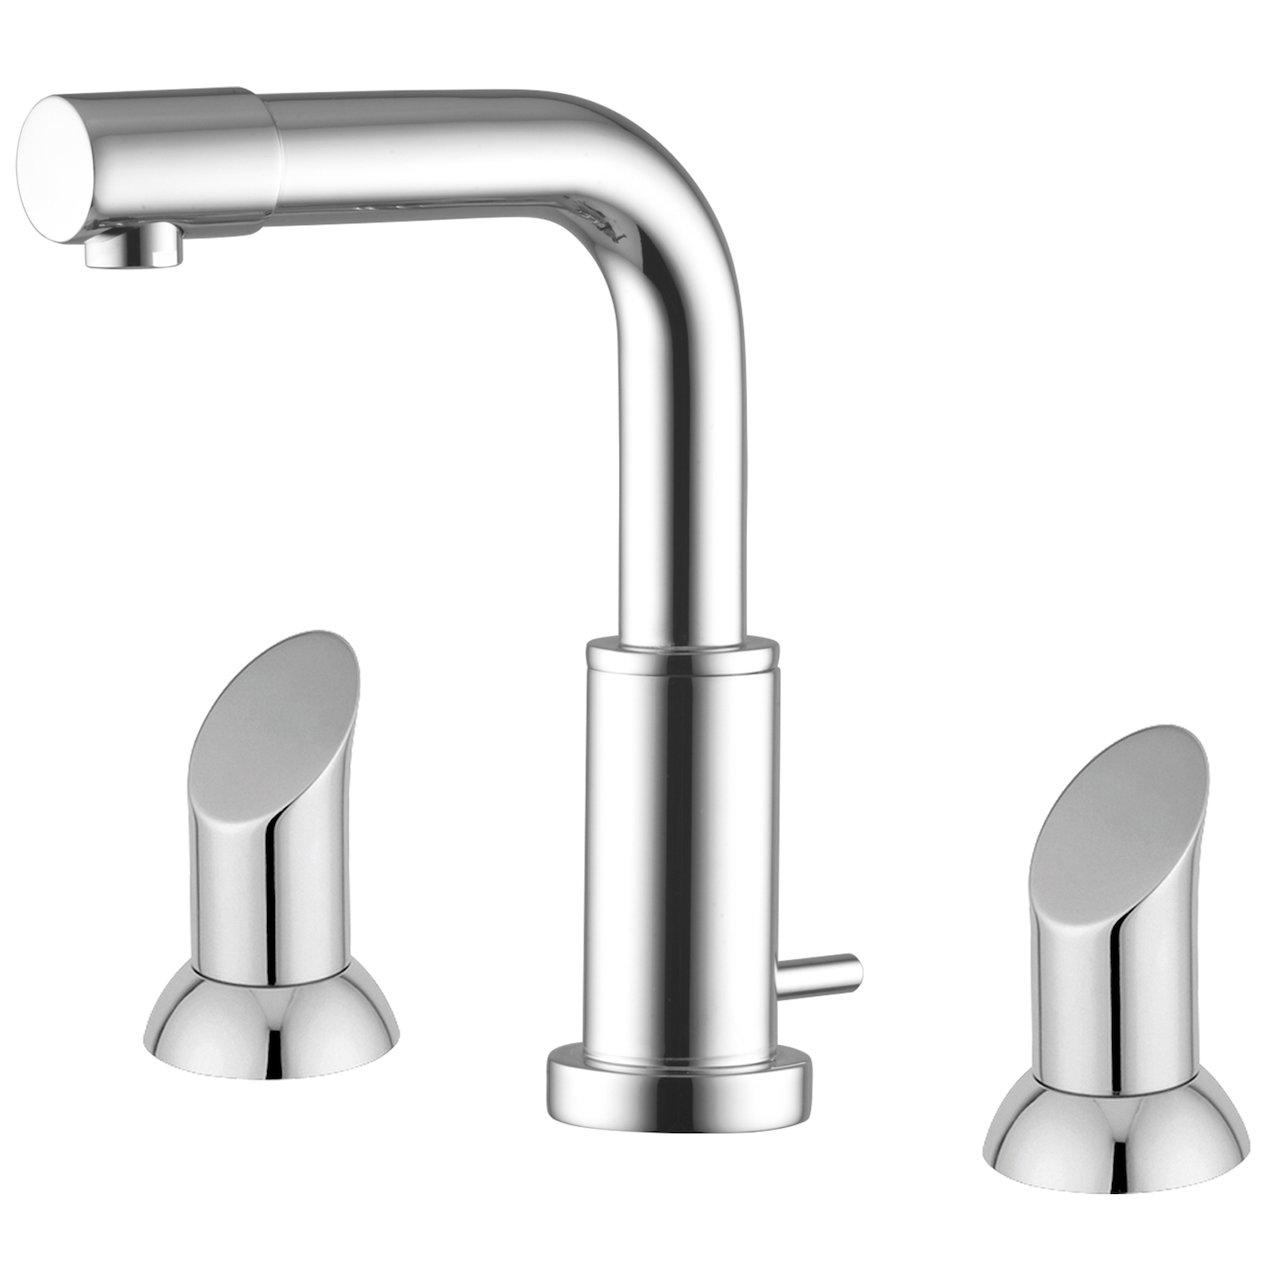 3 hole basin tap Ibis